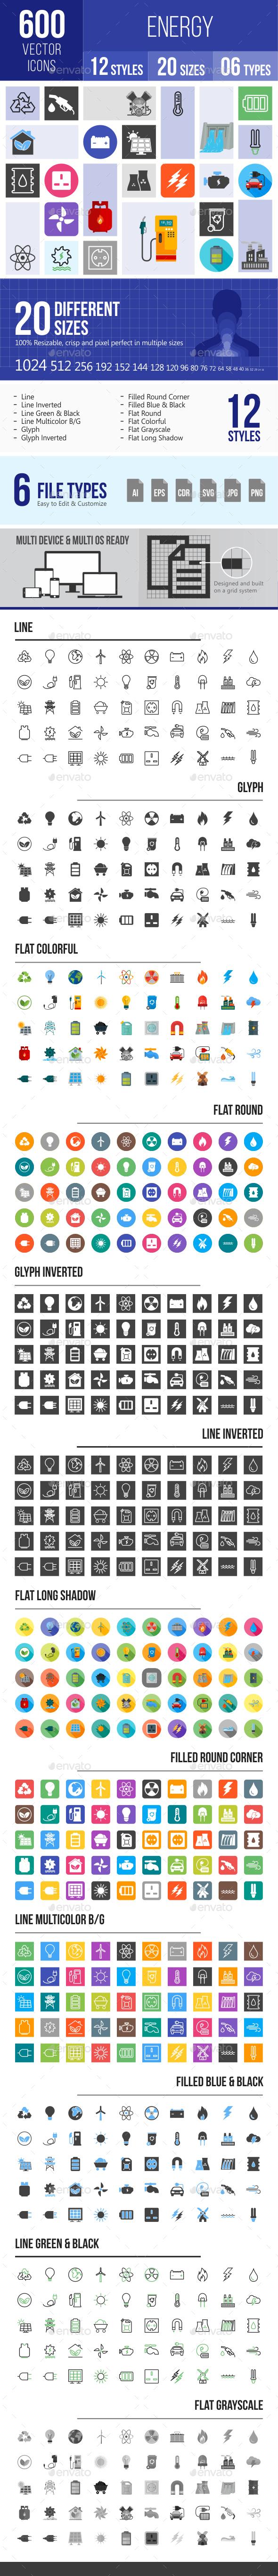 600 Energy Icons - Icons